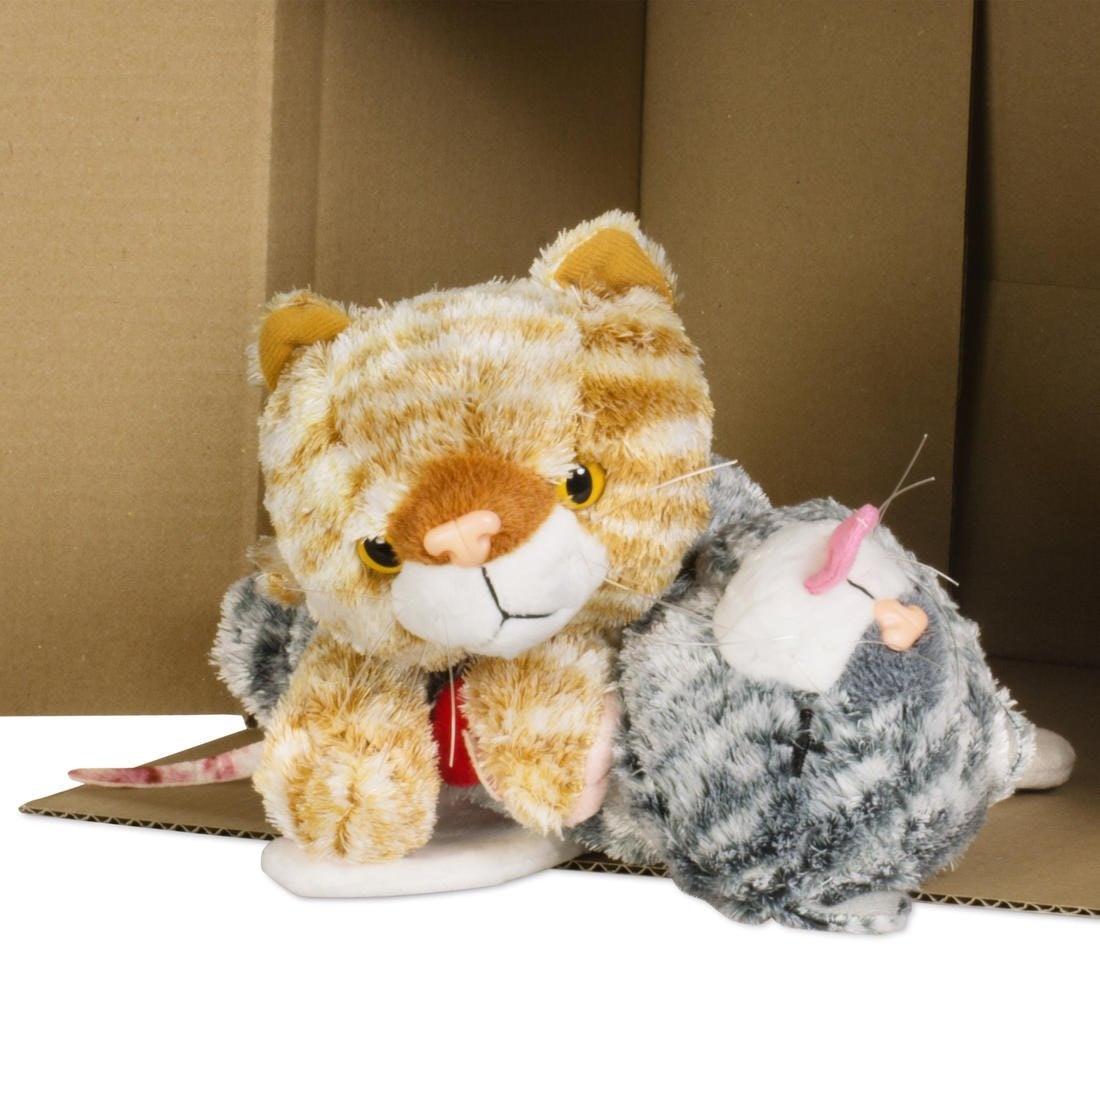 getDigital 12045 Schrödinger's Cat Science Plush Toy for Adults